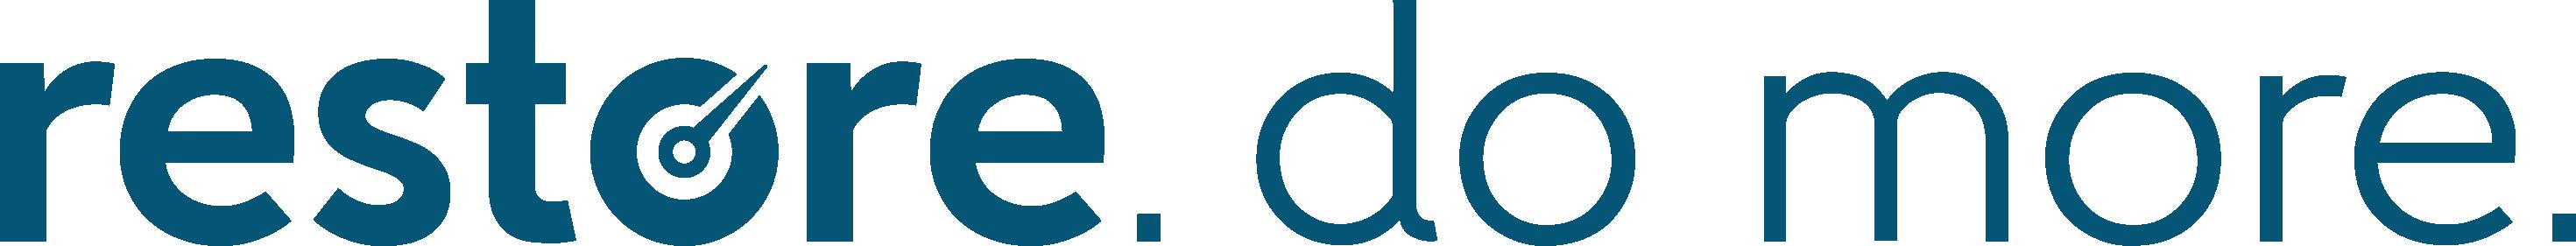 Motto Logo Blue